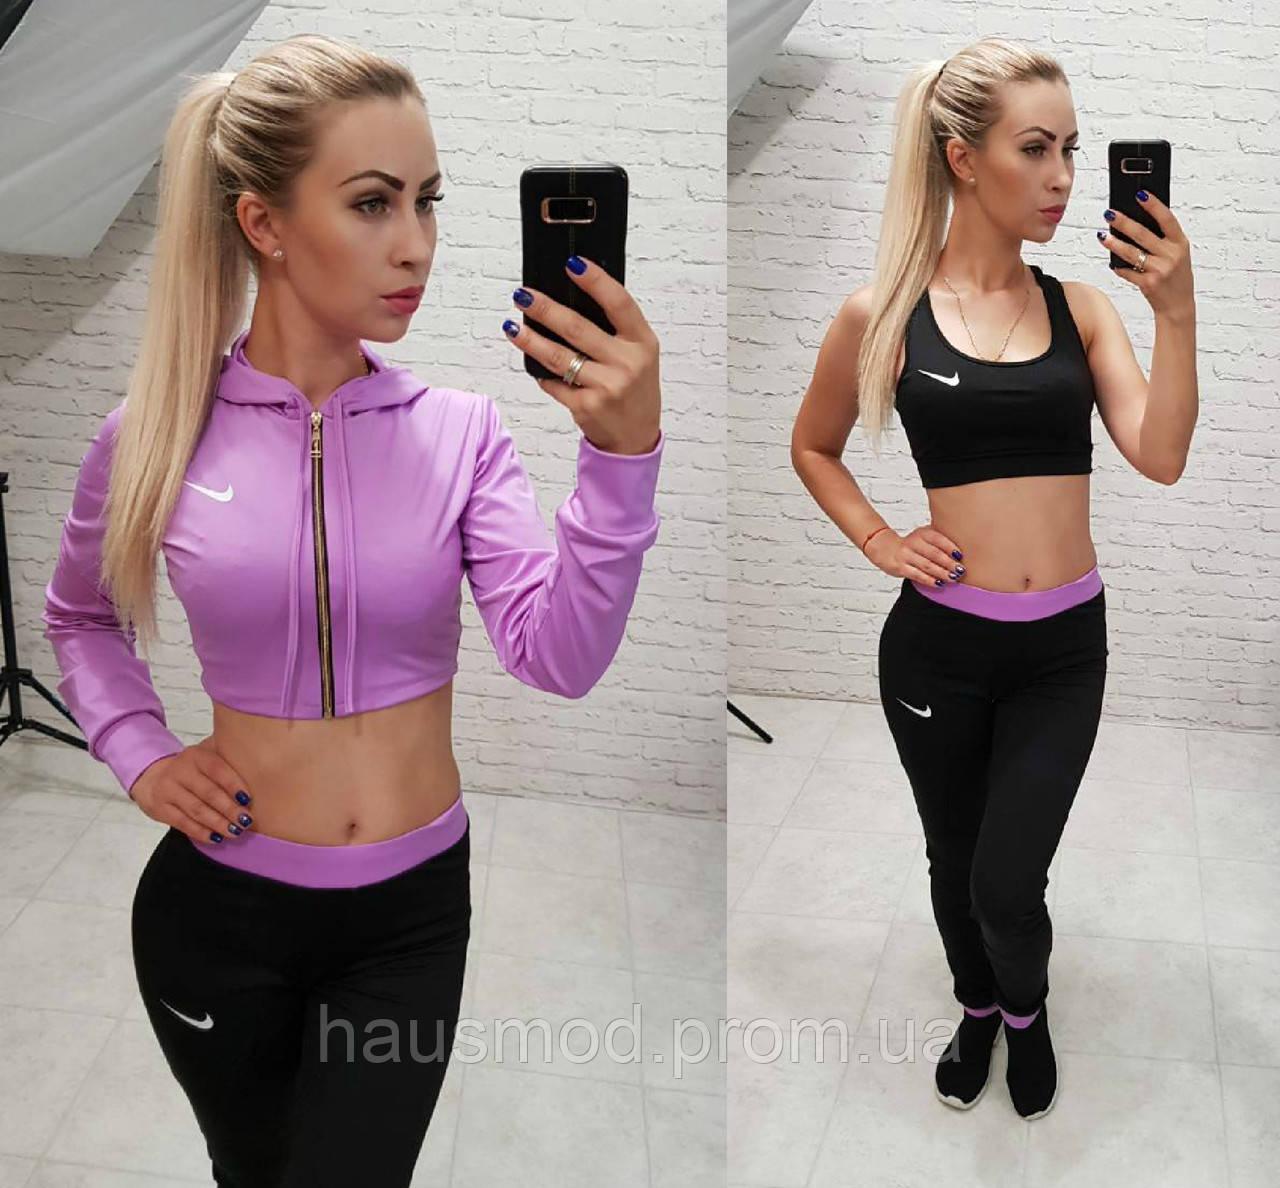 Фитнес костюм 3-ка реплика Nike мастерка мини топ и лосины микро дайвинг фиолет